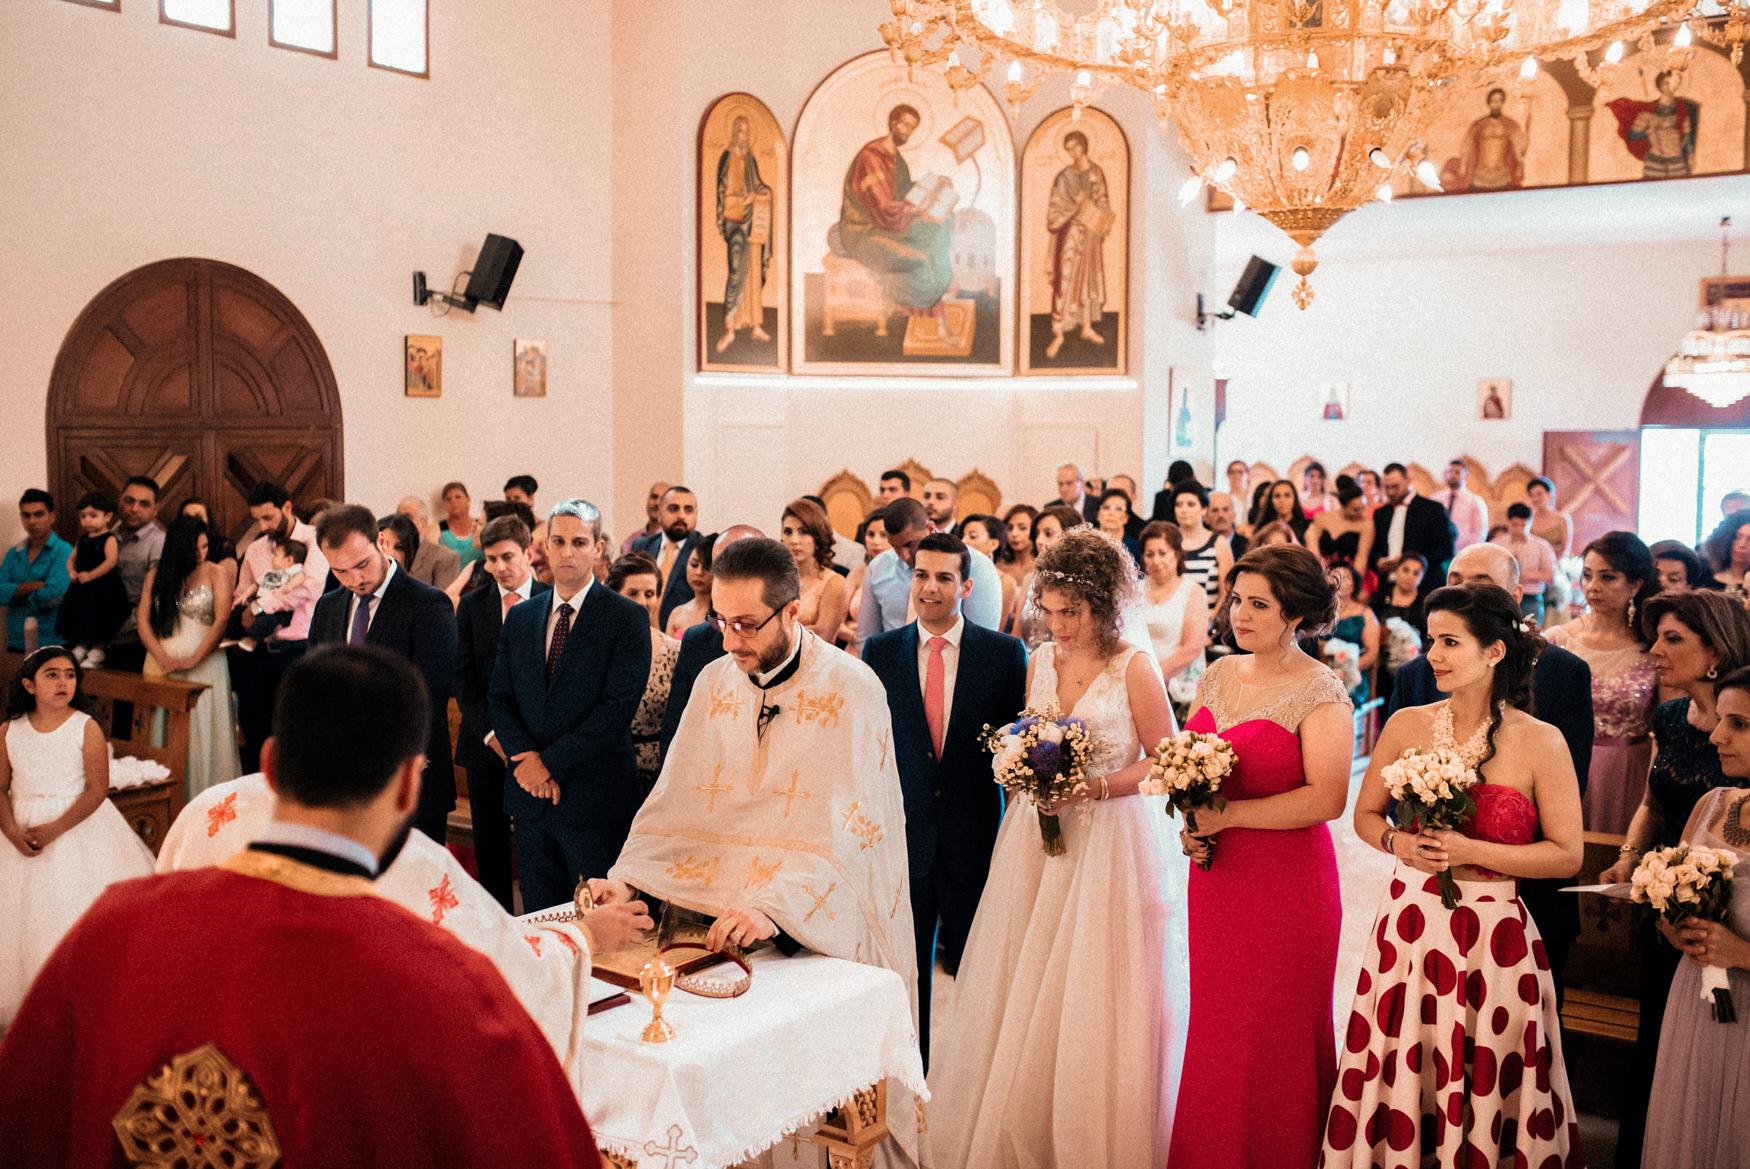 LR3 byblos beirut church wedding ceremony lebanon 006.jpg